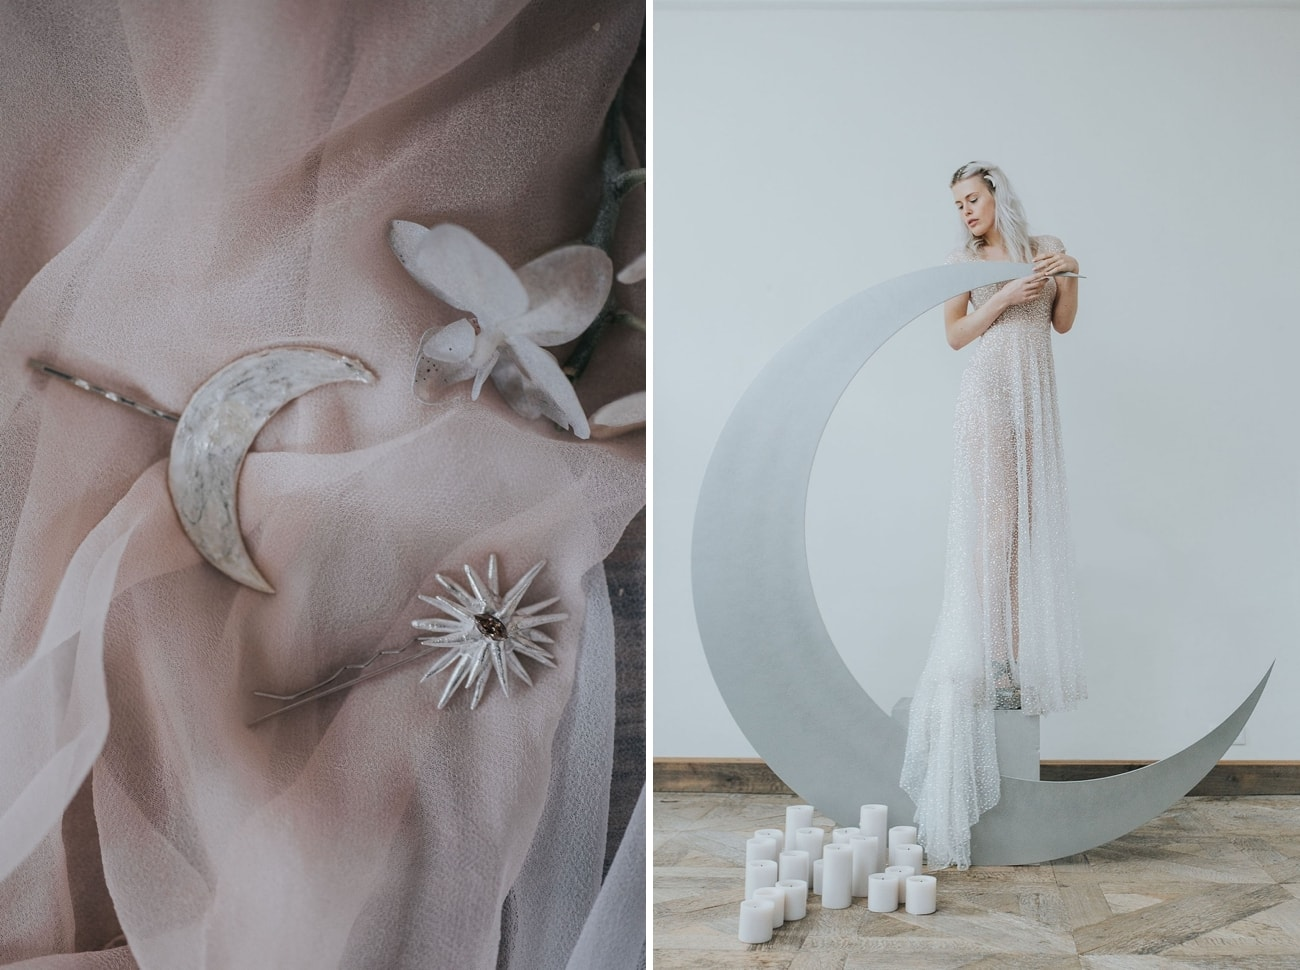 Celestial Bridal Accessories | Credit: Cornelia Lietz